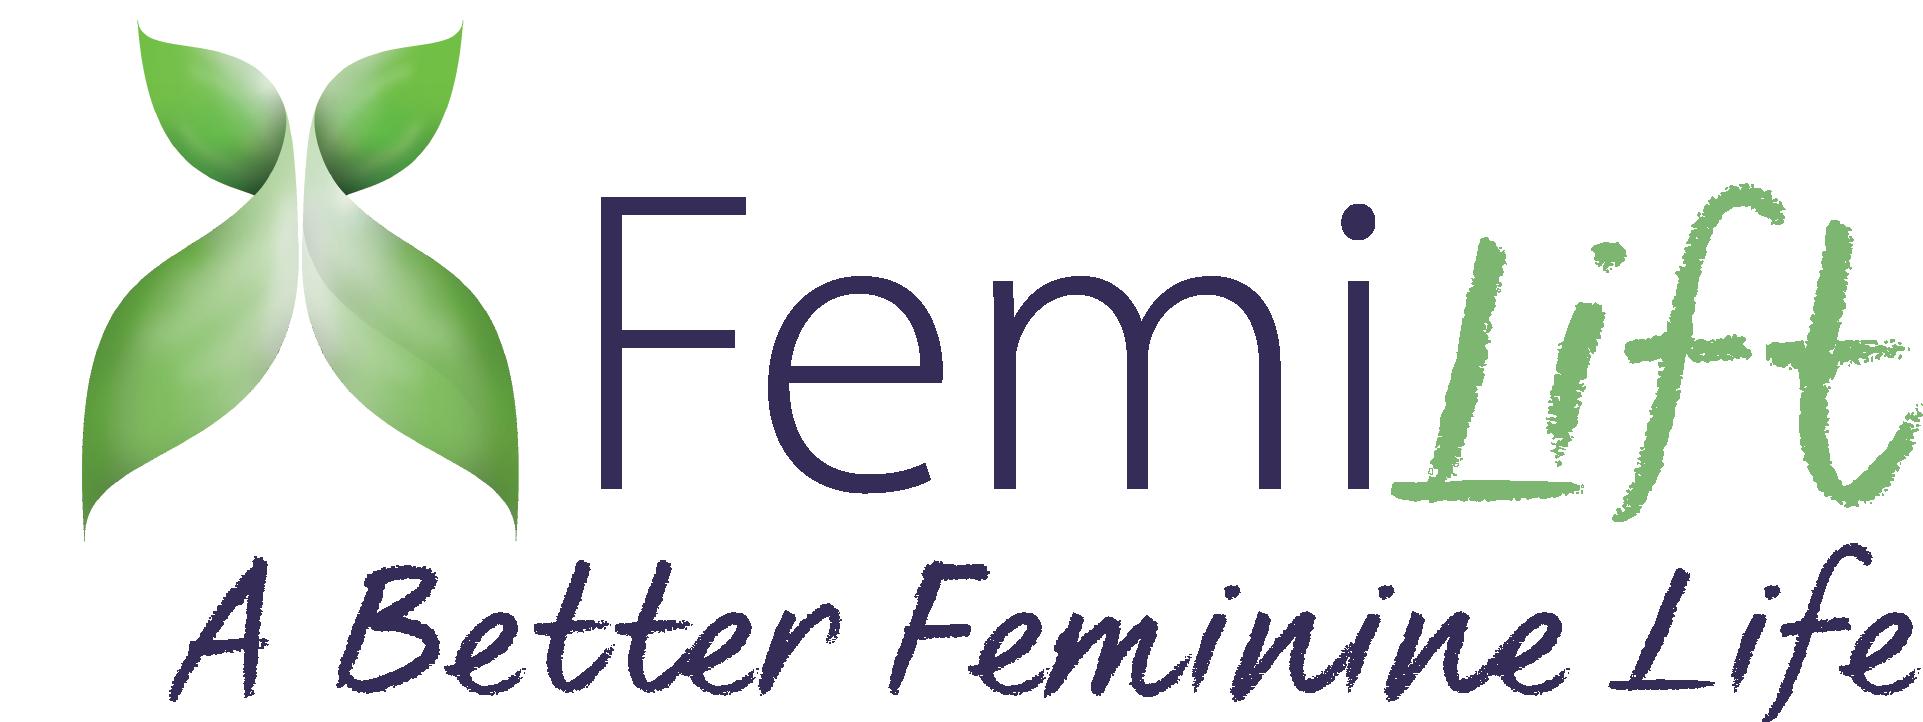 Vaginal Rejuvenation with Femilift - InnerImage